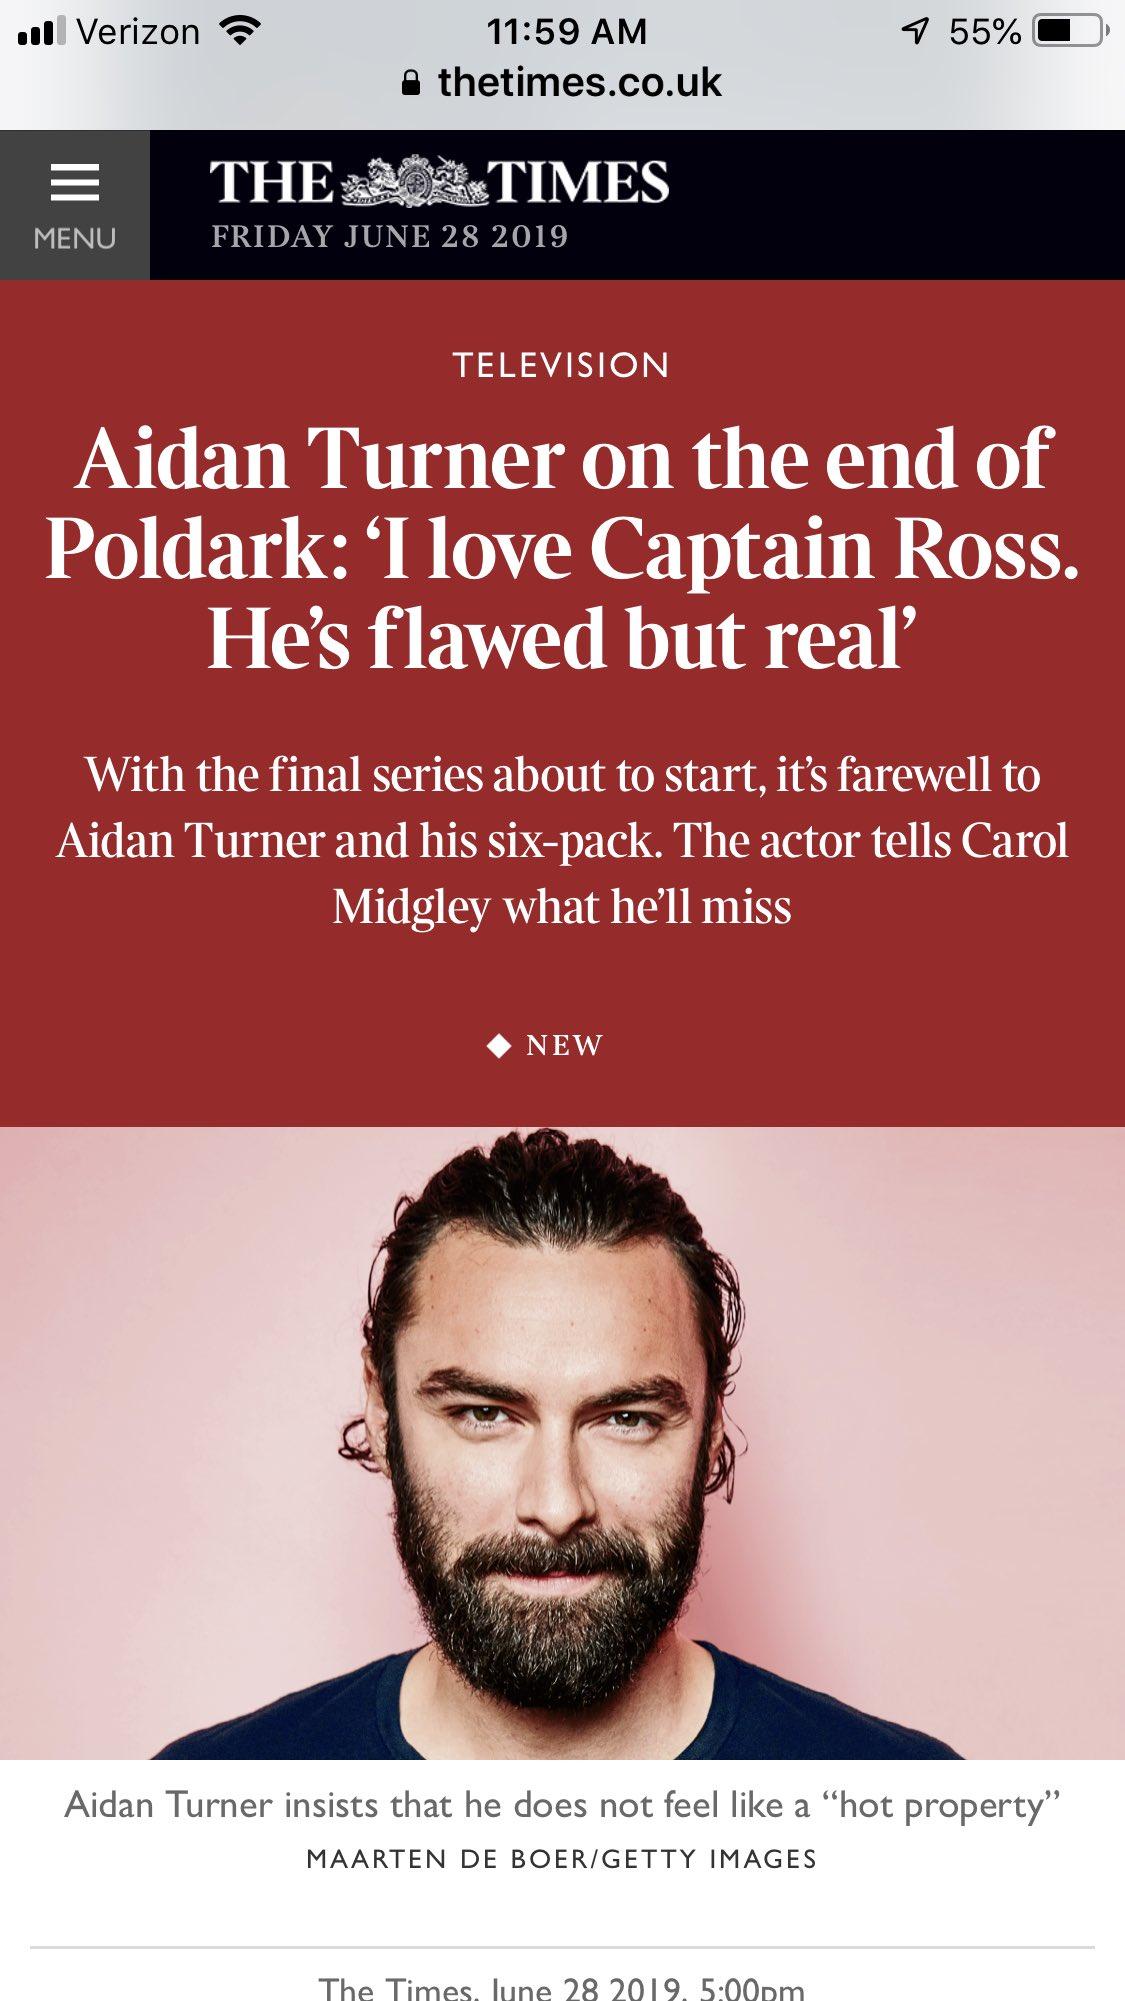 The Times Article on Aidan Turner and Poldark S5 – Aidan